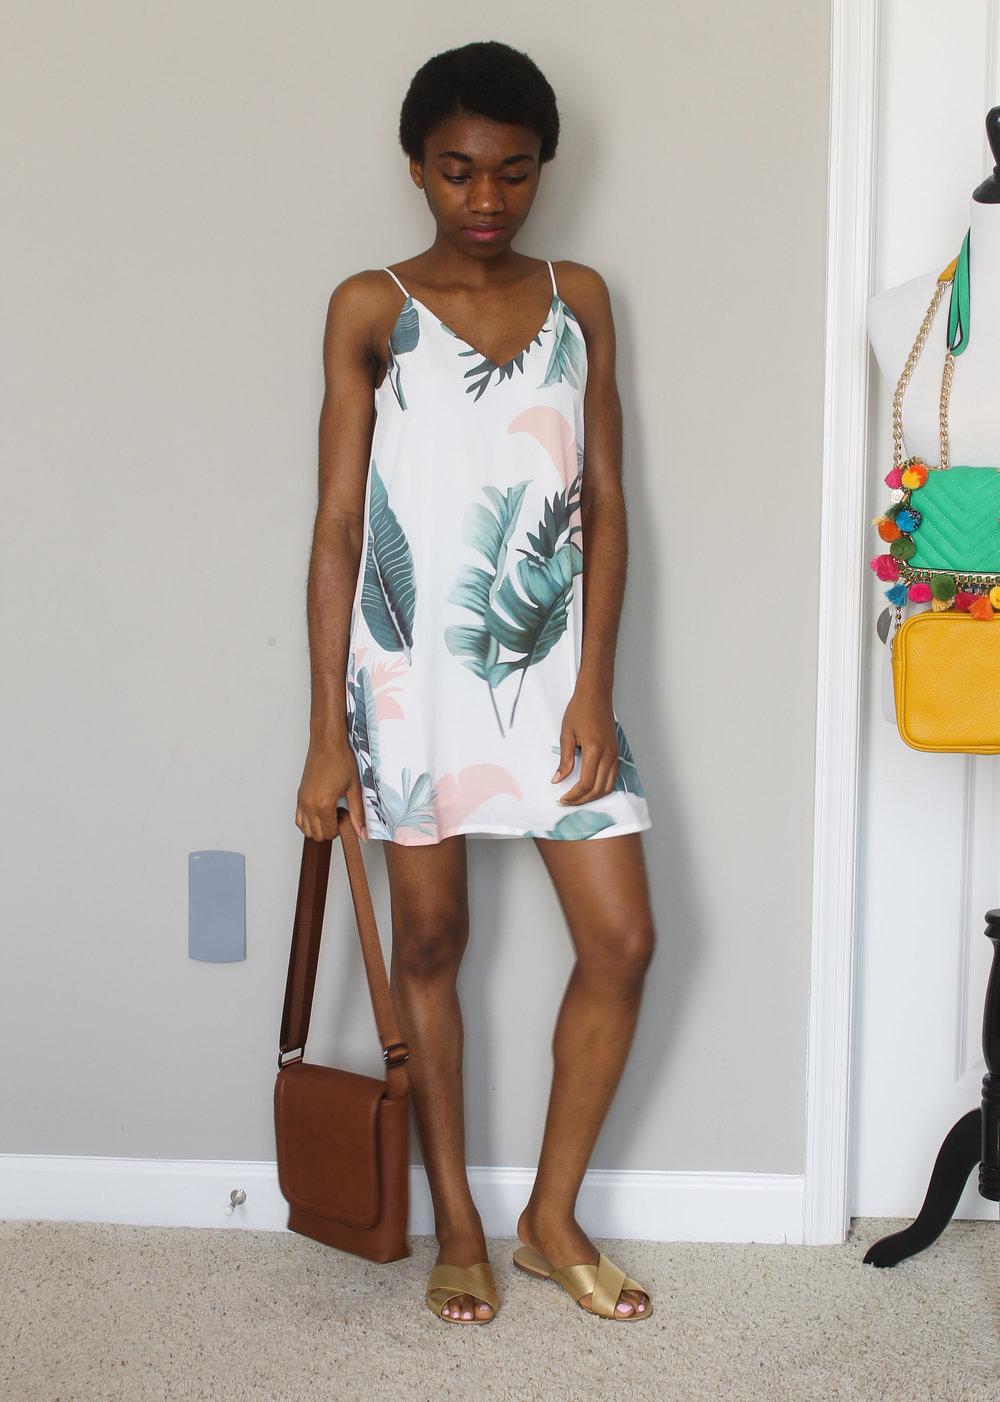 4WaystoWear-tropical-prints-dress 4.jpg